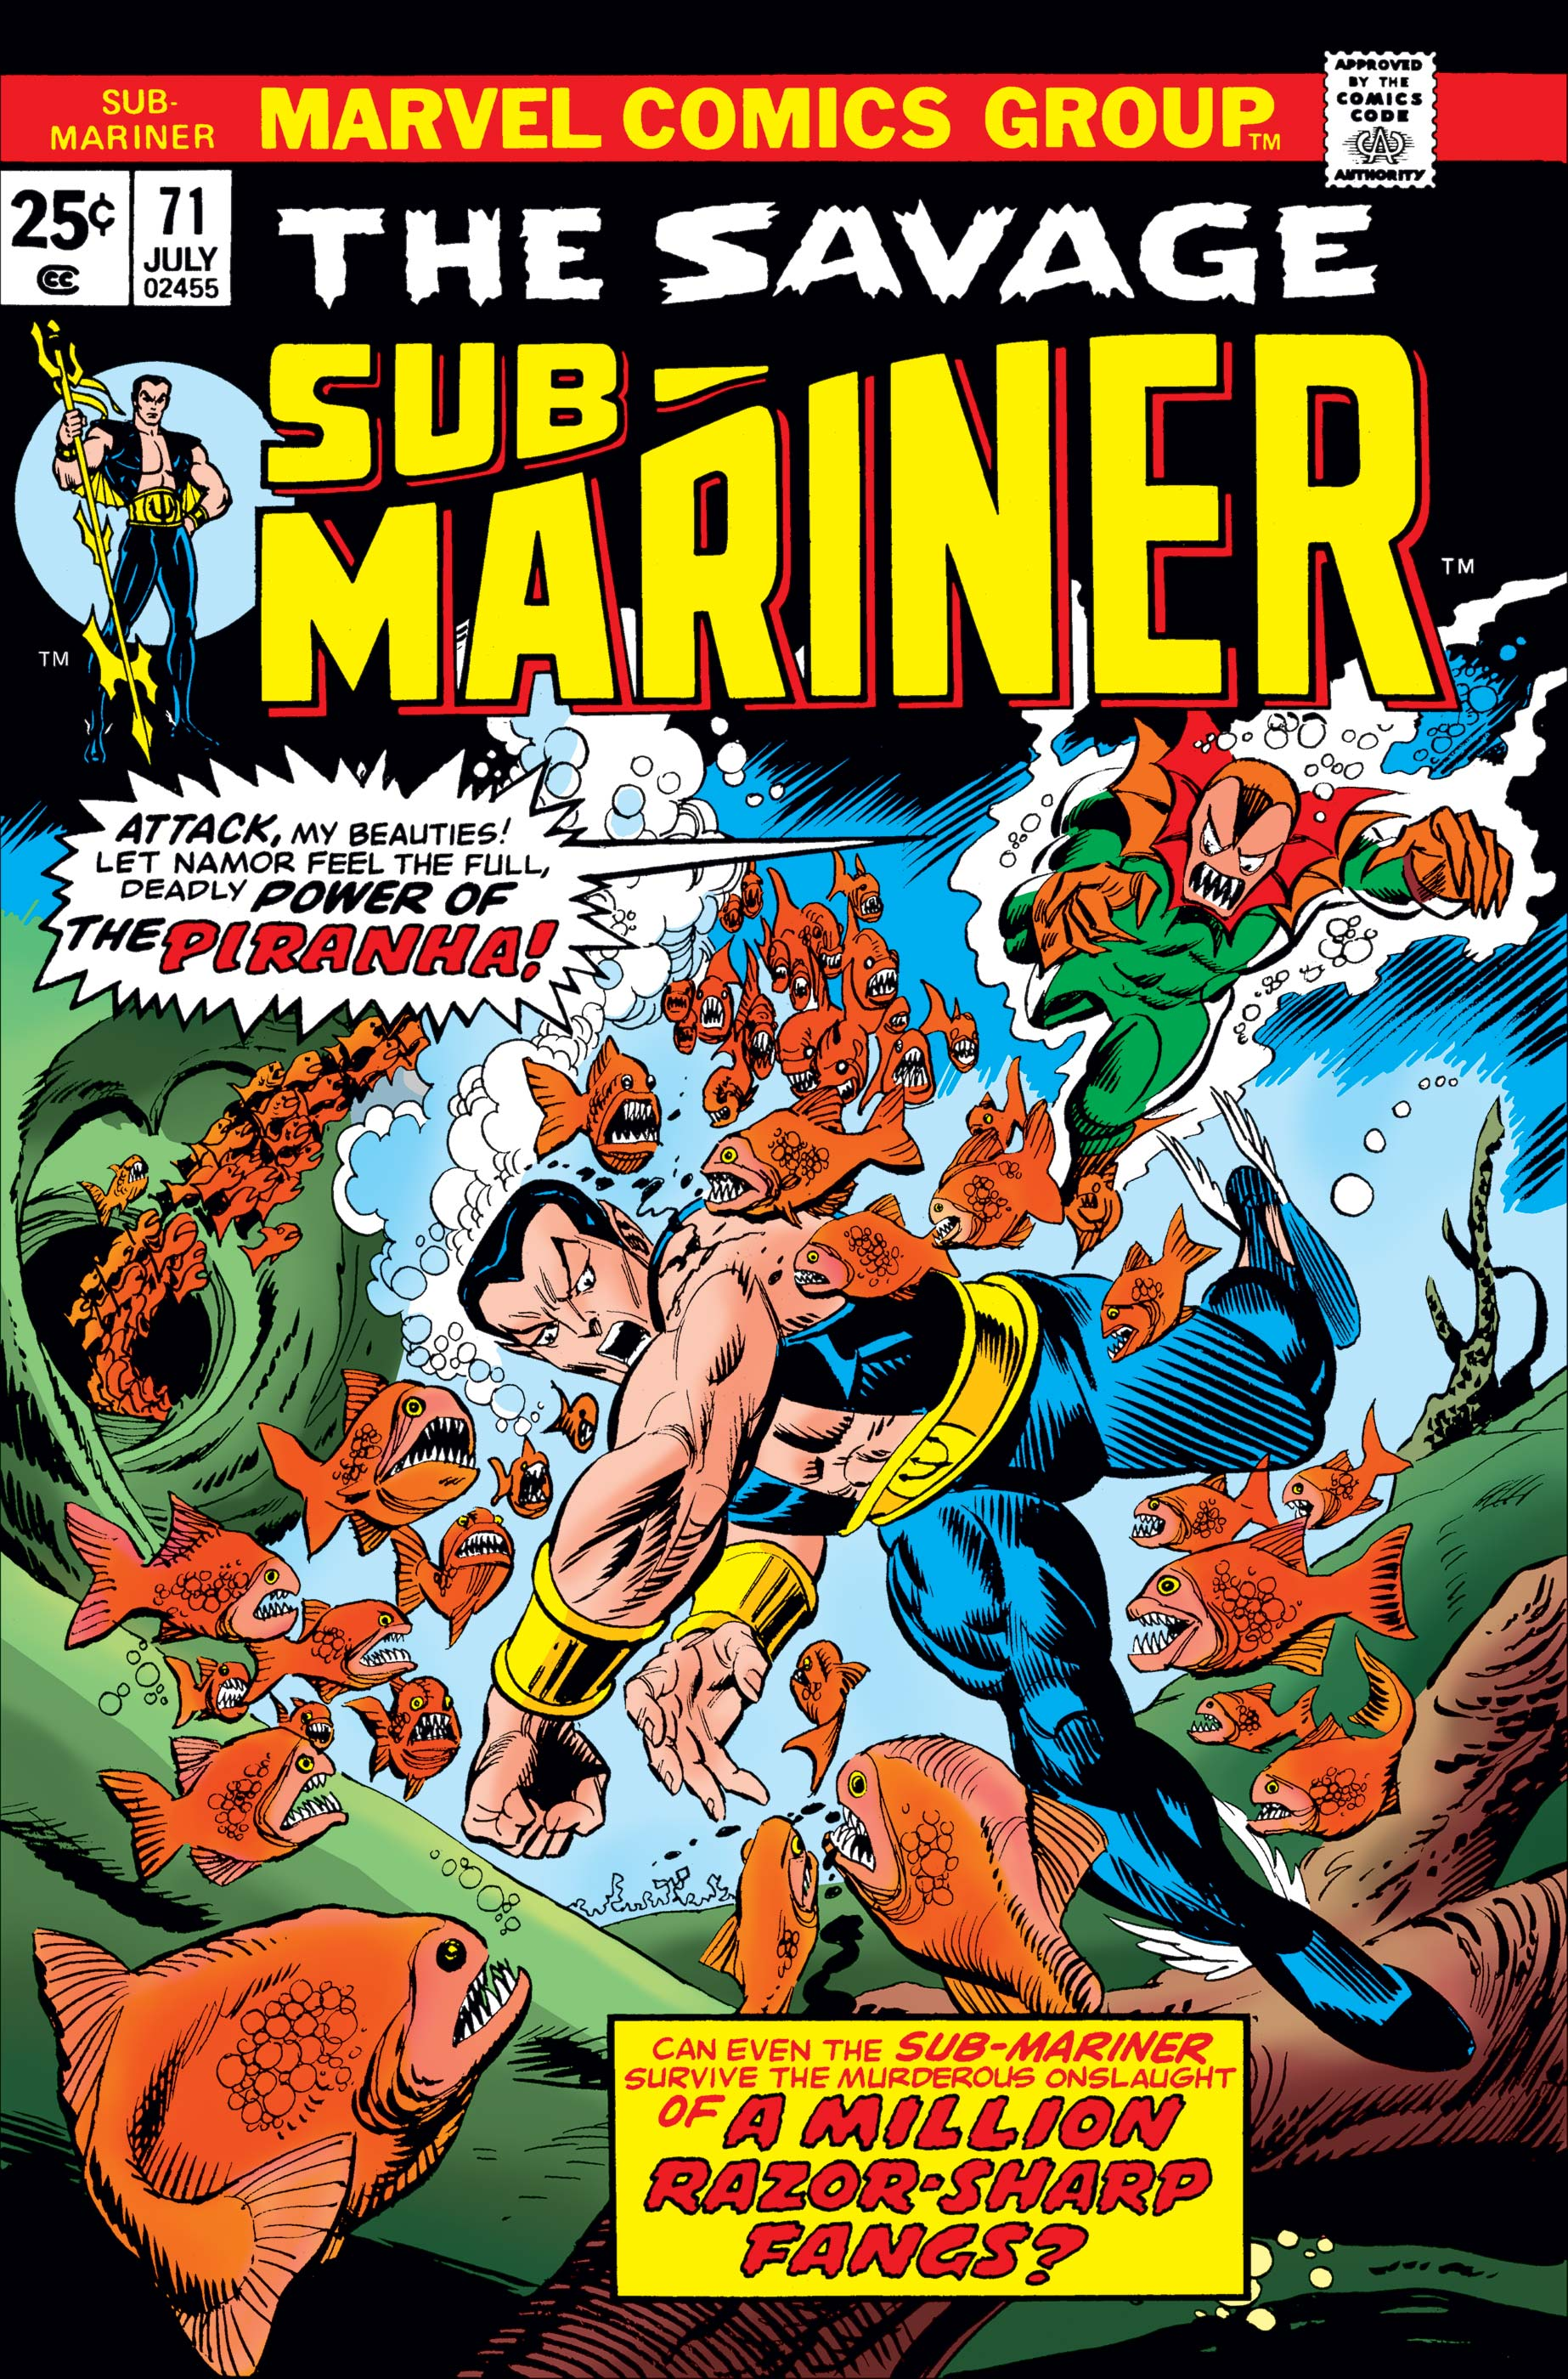 Sub-Mariner (1968) #71